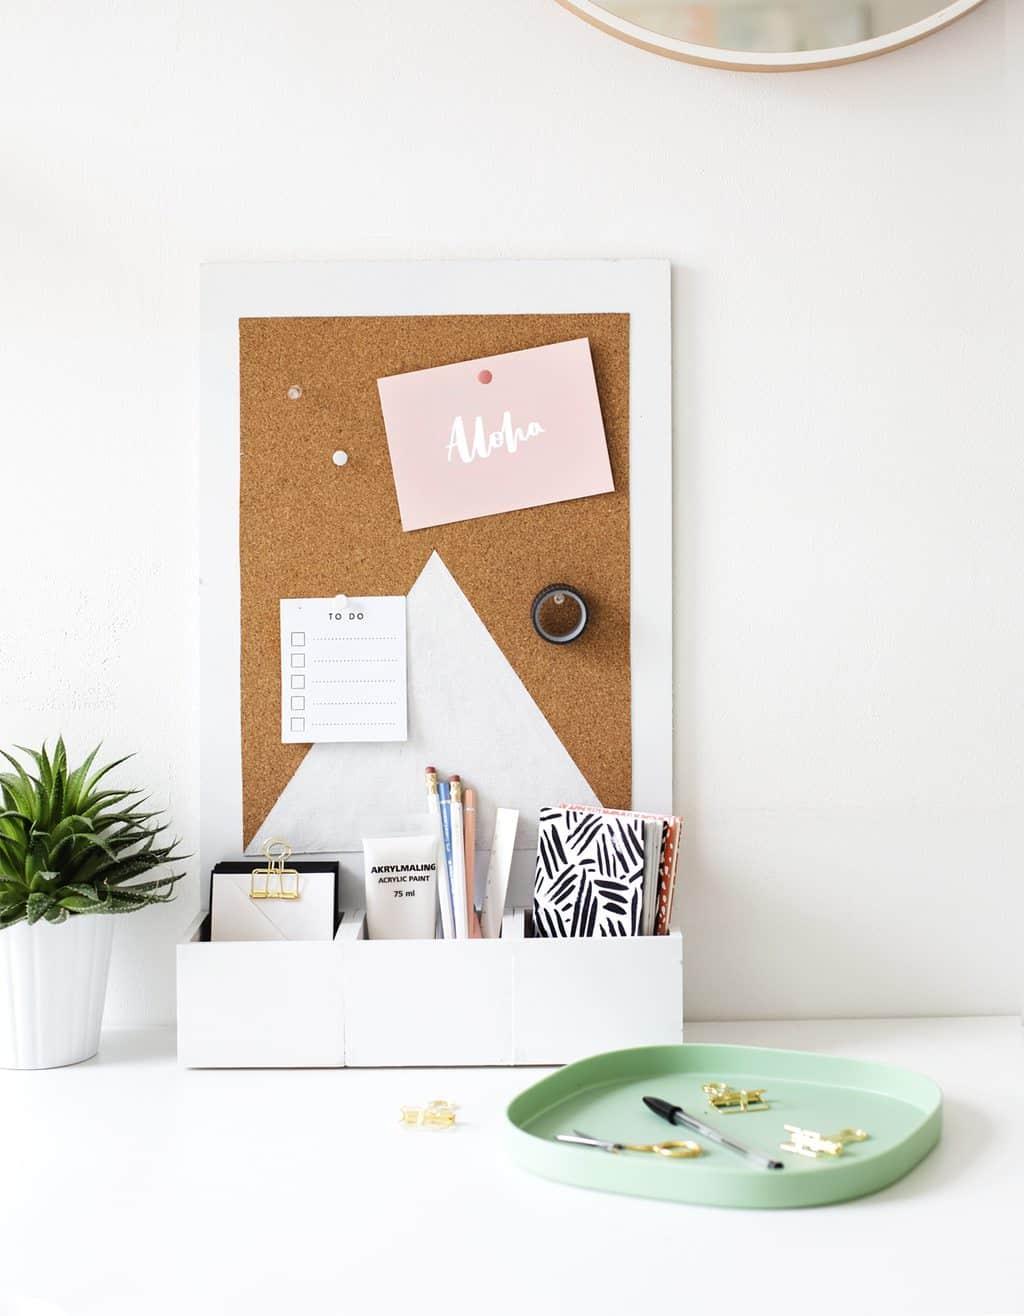 photo of a diy desk organizer with a cork board by top Houston lifestyle blogger Ashley Rose of Sugar & Cloth